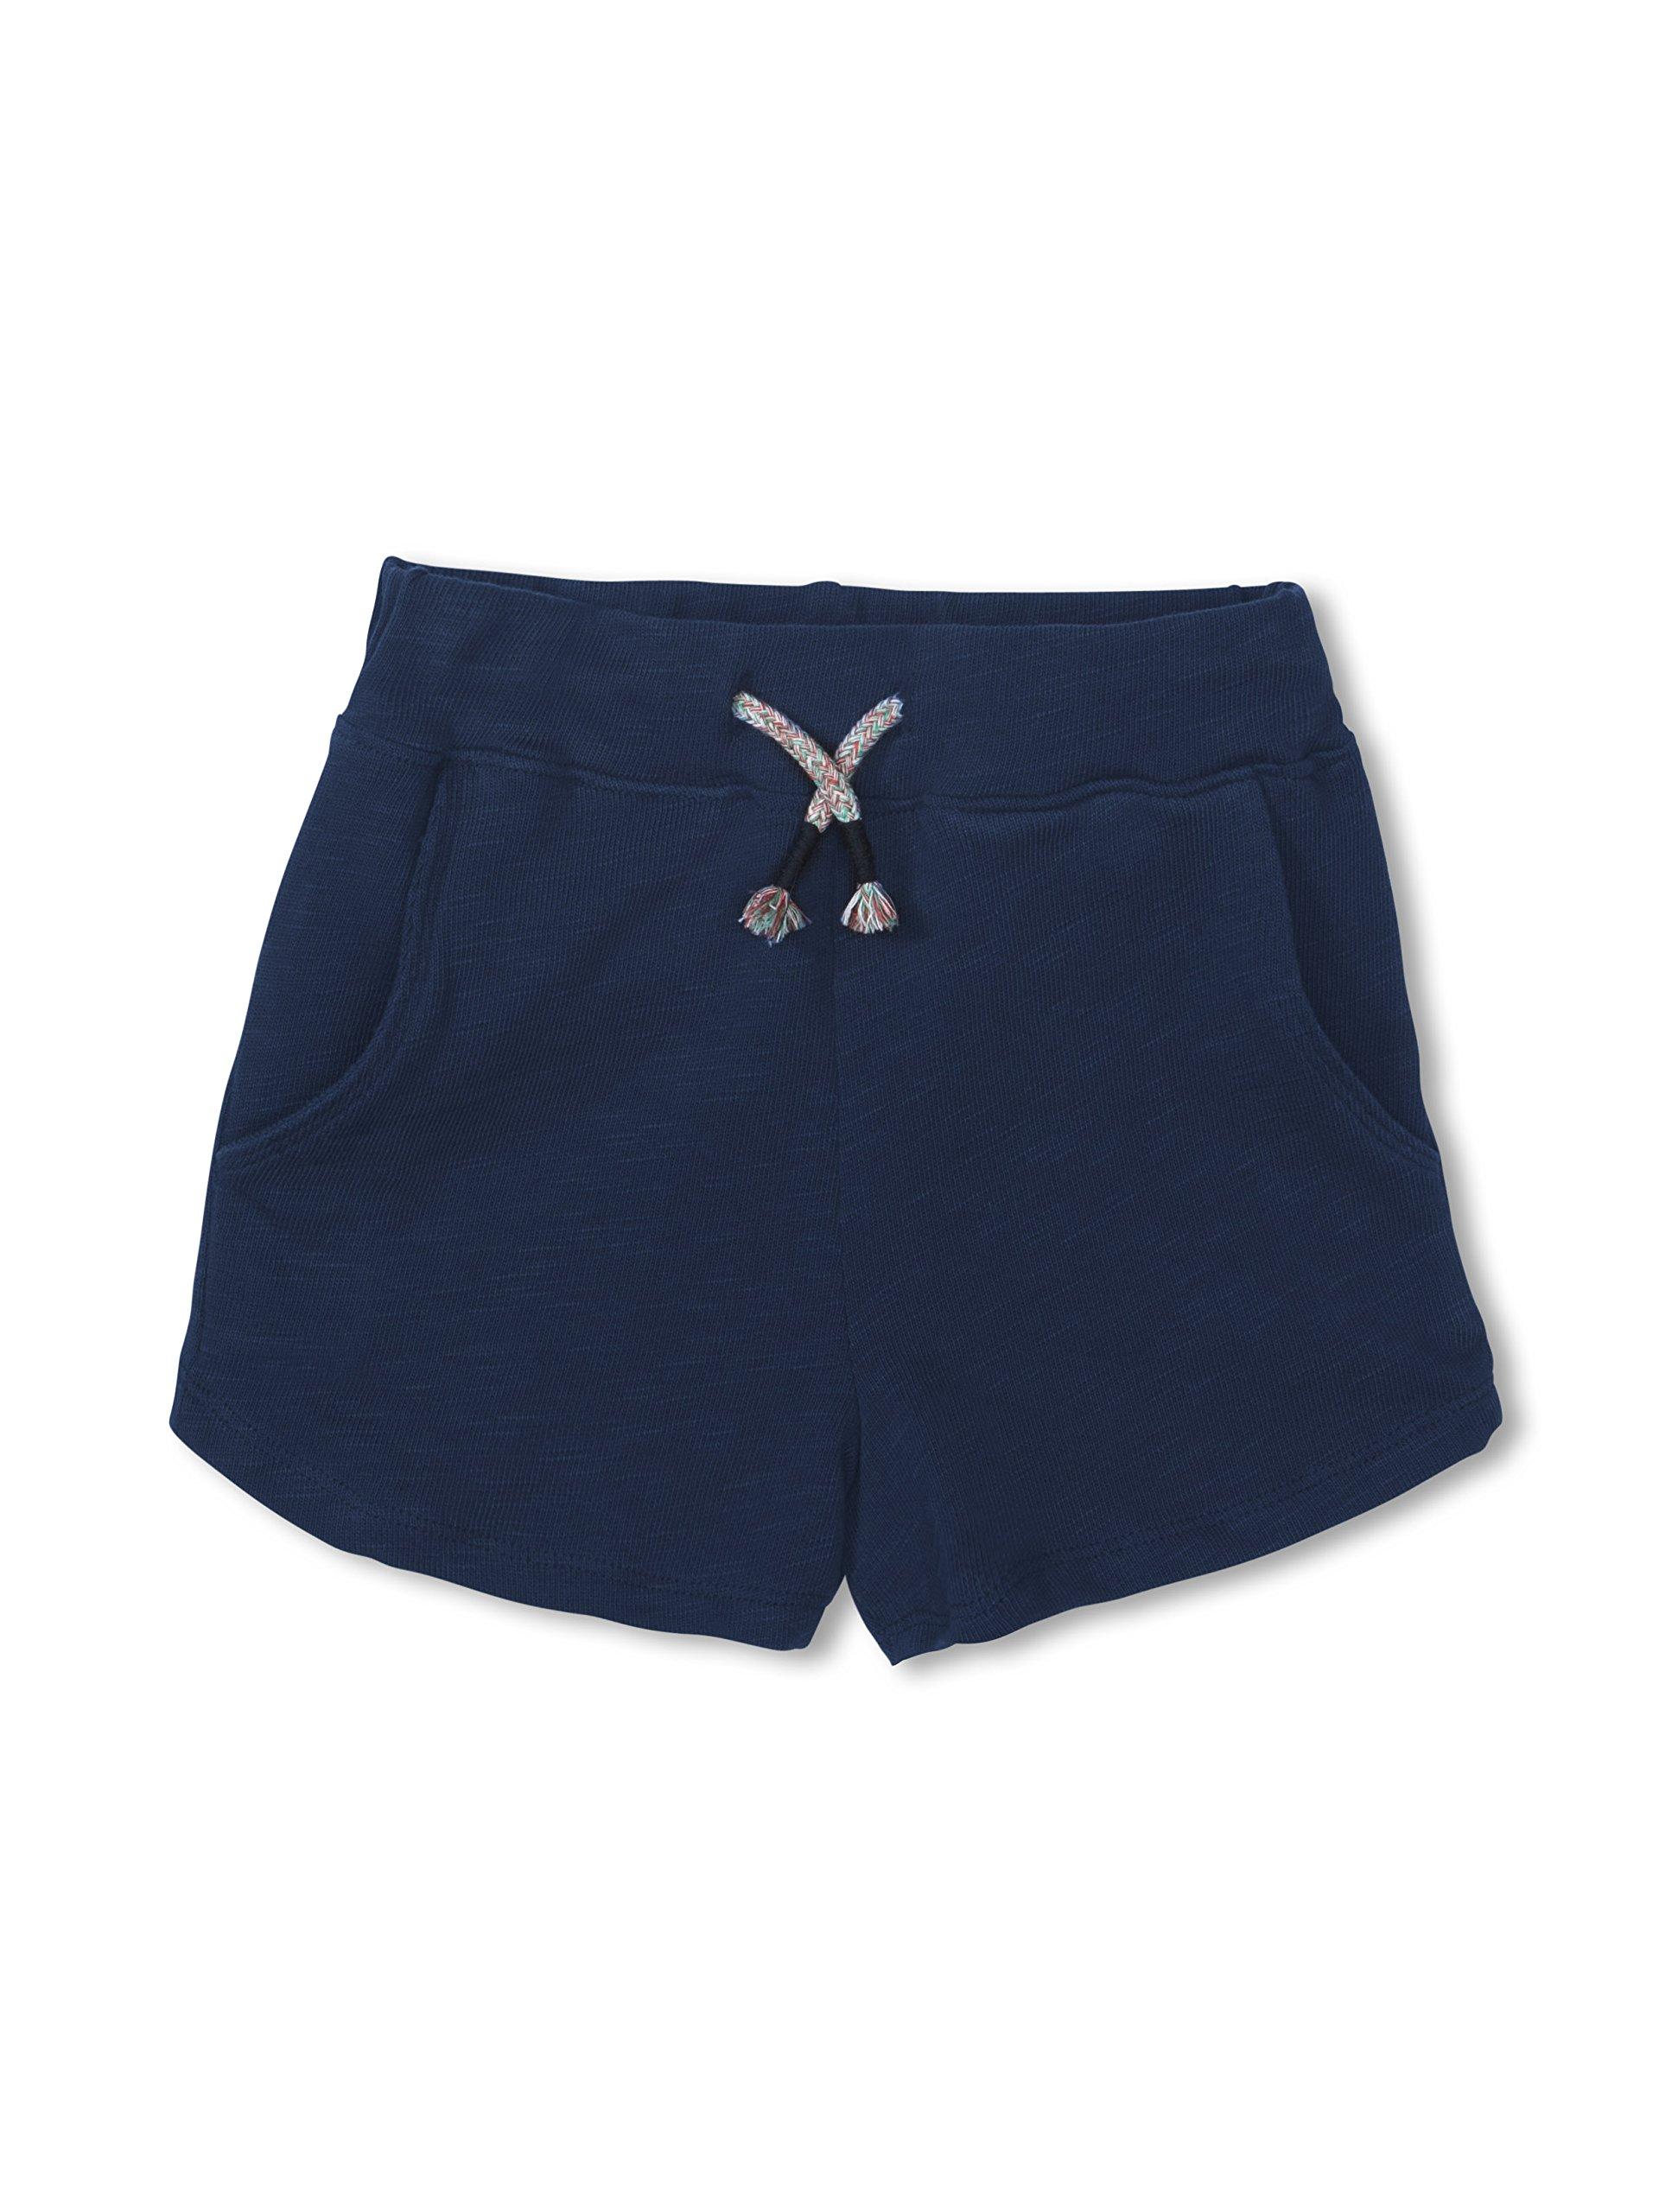 Colored Organics Girls Organic Nika Sport Shorts, Nautical Navy, 6